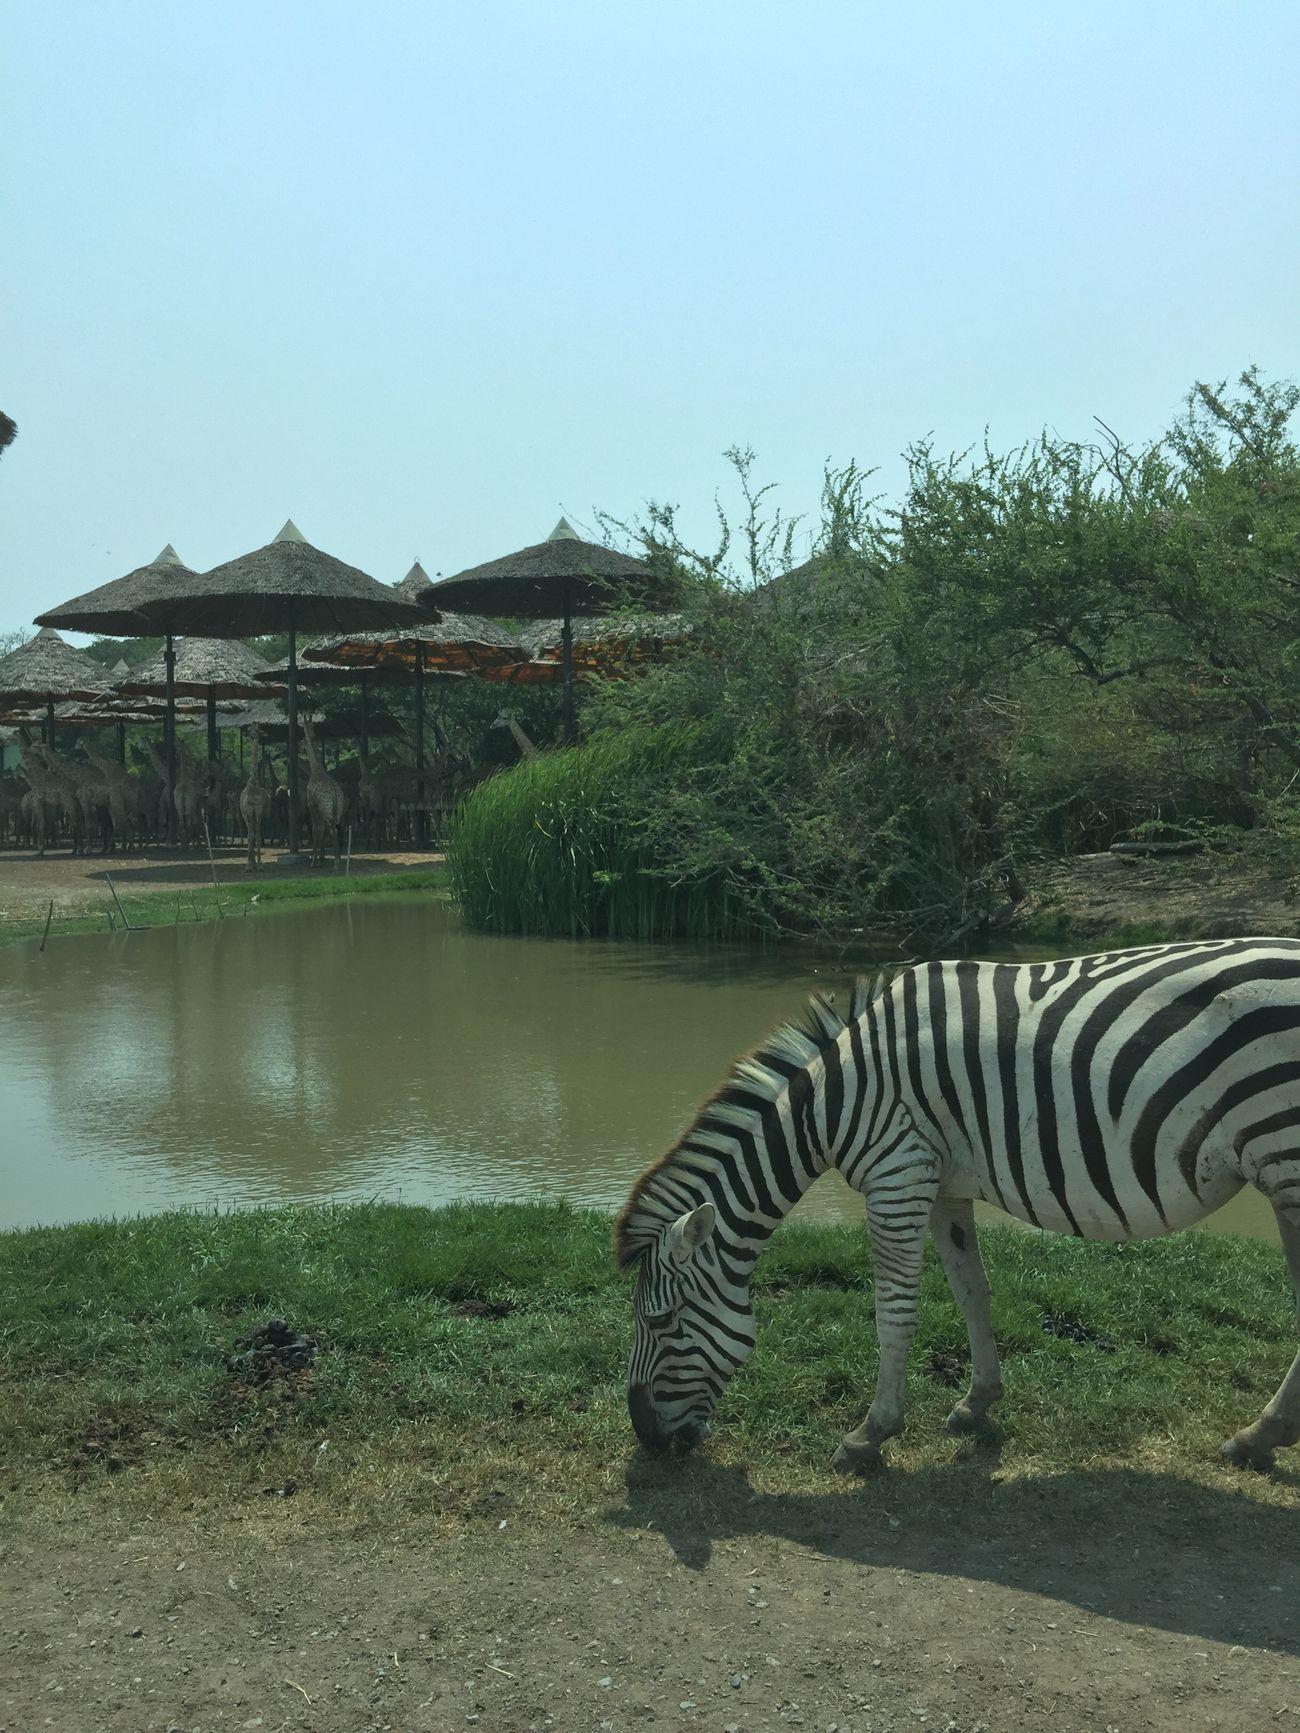 Zebra Zoo IPhoneography